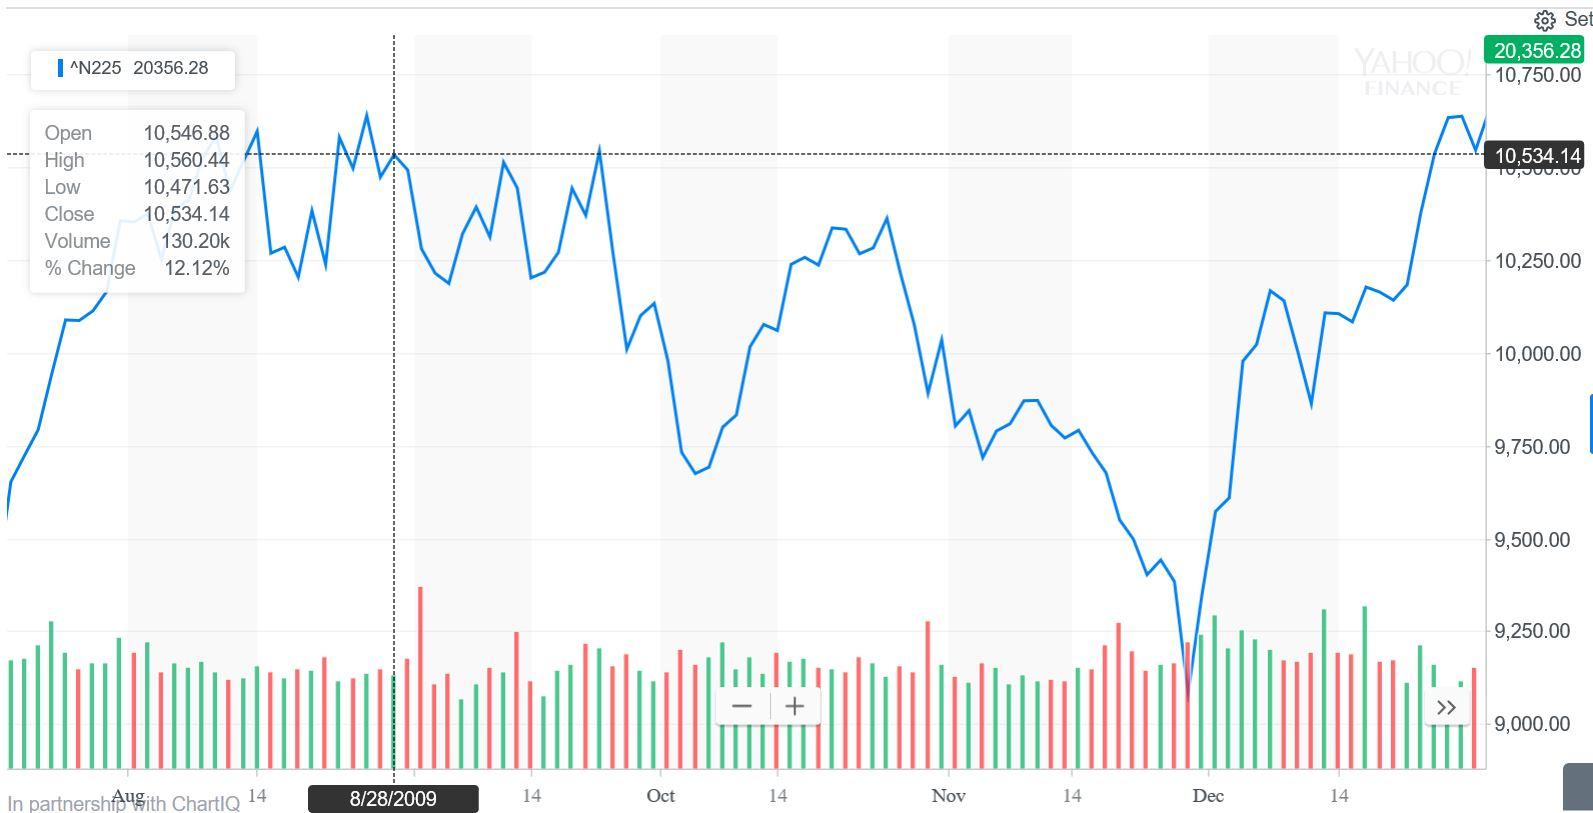 a646ae350b6280f9cd2e59437499c309 - 選挙があると株価は上がる!?<br>株価と選挙の意外な関係